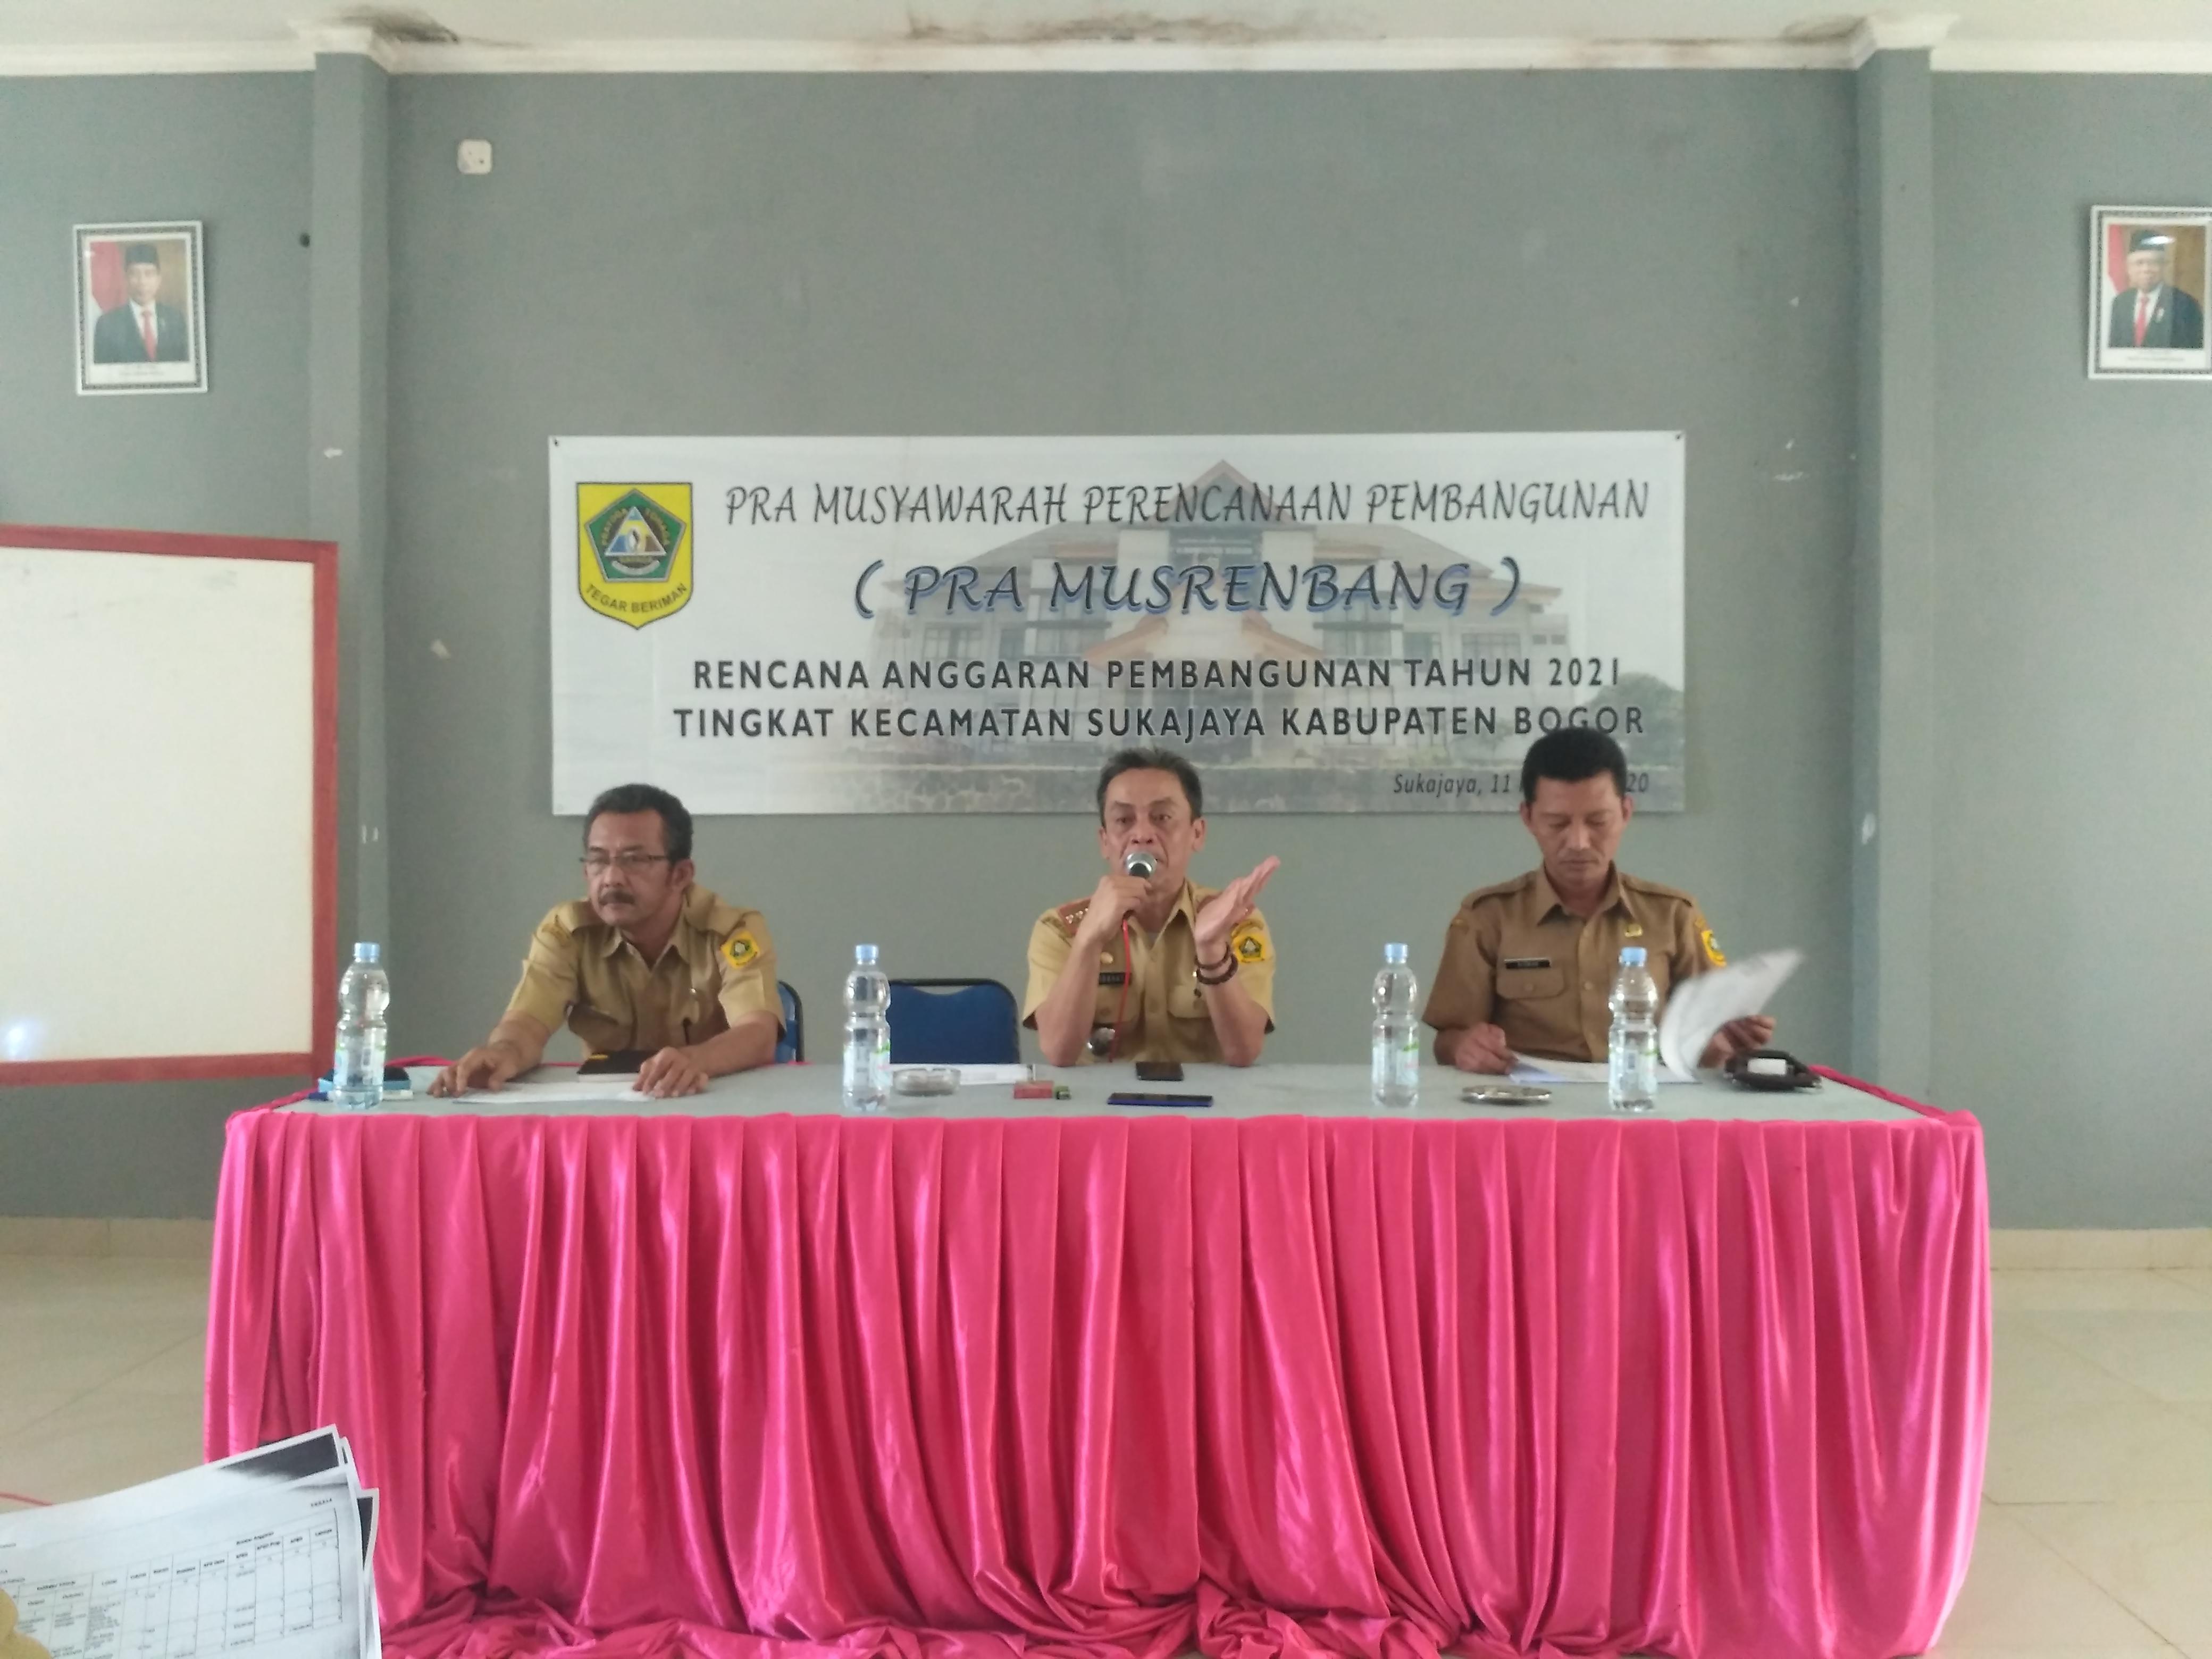 Pra Musrenbang Kecamatan Sukajaya Kabupaten Bogor